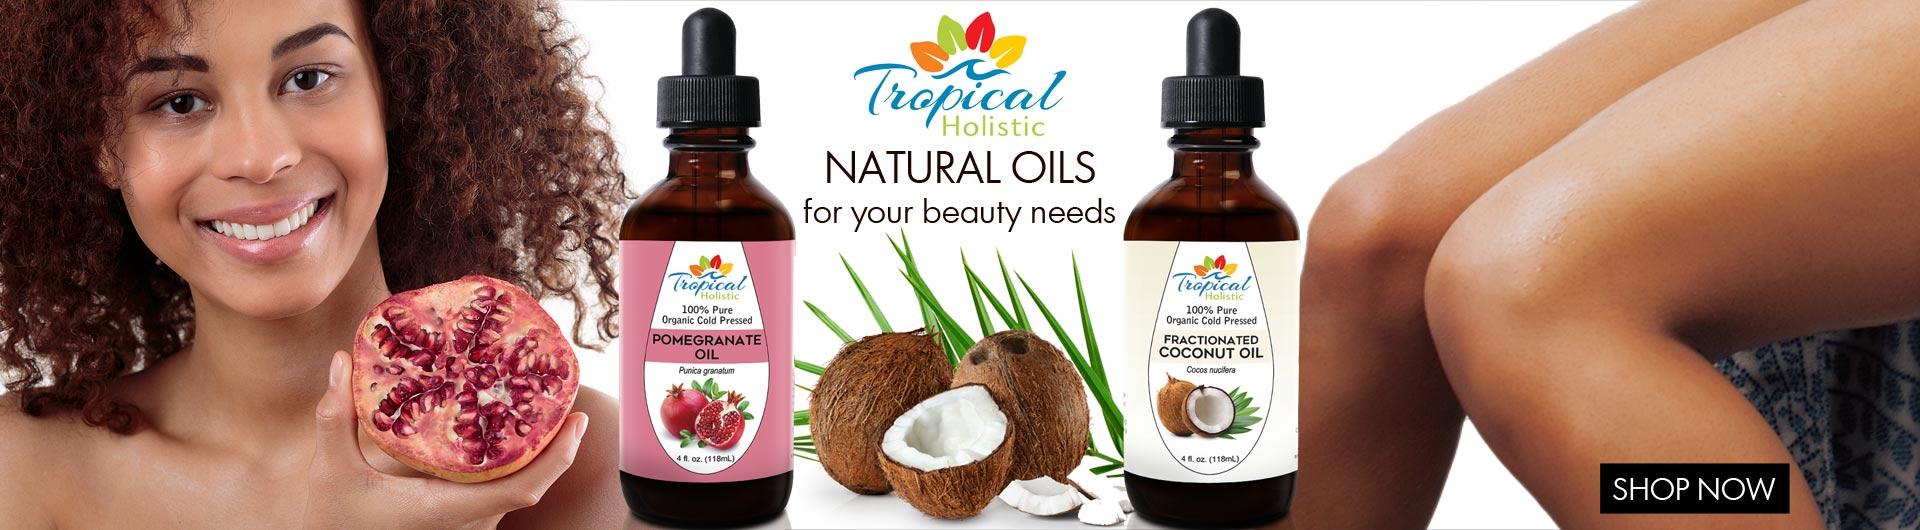 Tropical Holistic Natural Oils